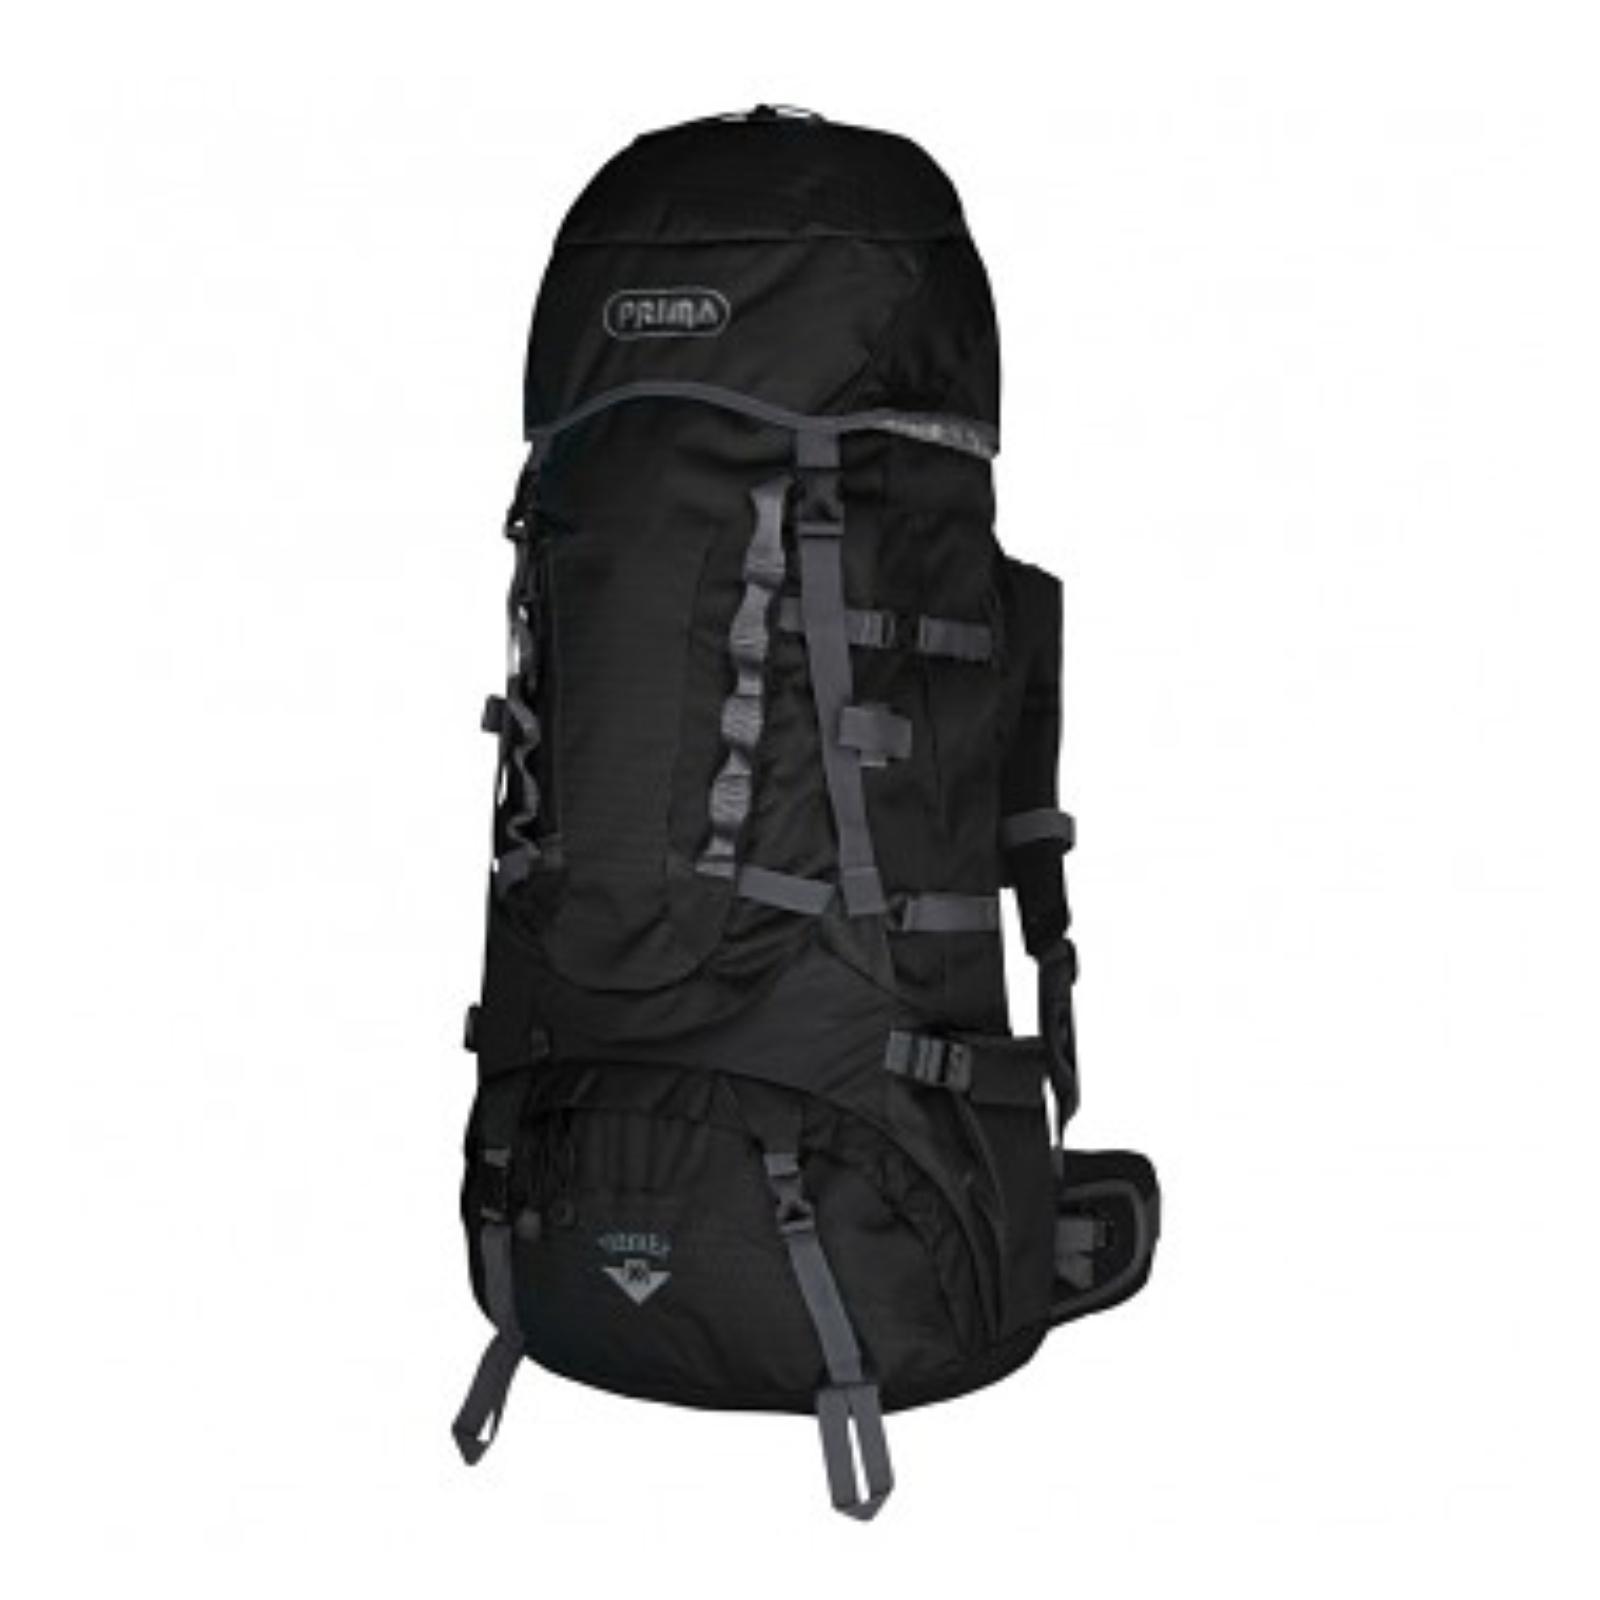 Batoh PRIMA Trekker 65 - černý